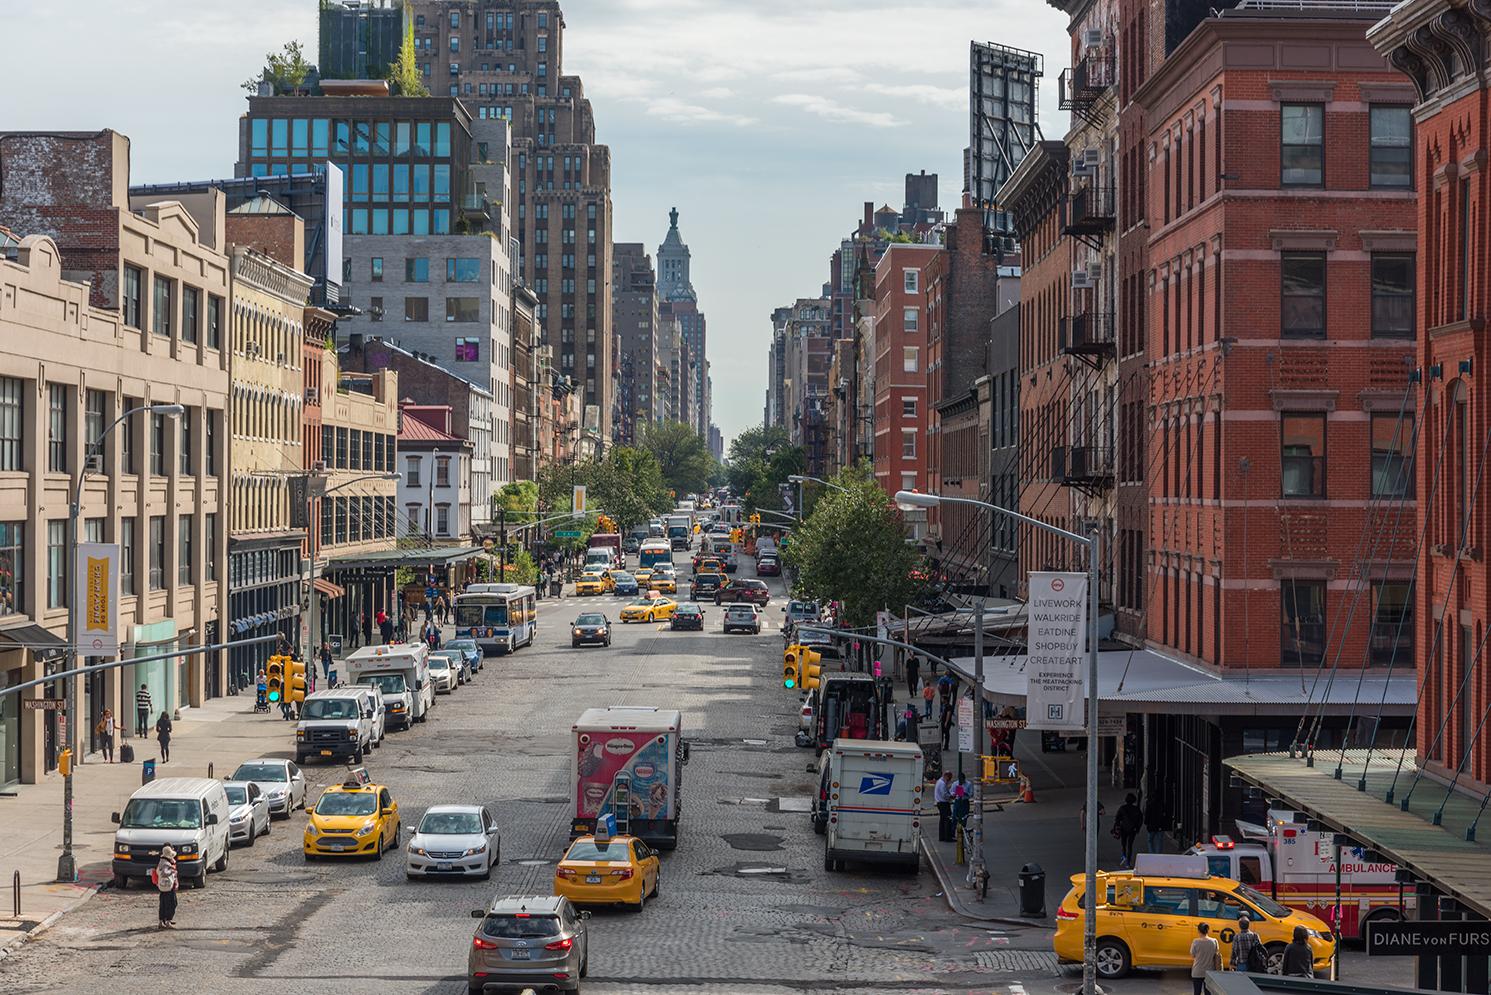 ROCK MAMA NYC LIFESTYLE BLOG - HIGHLINE PARK - PART 1